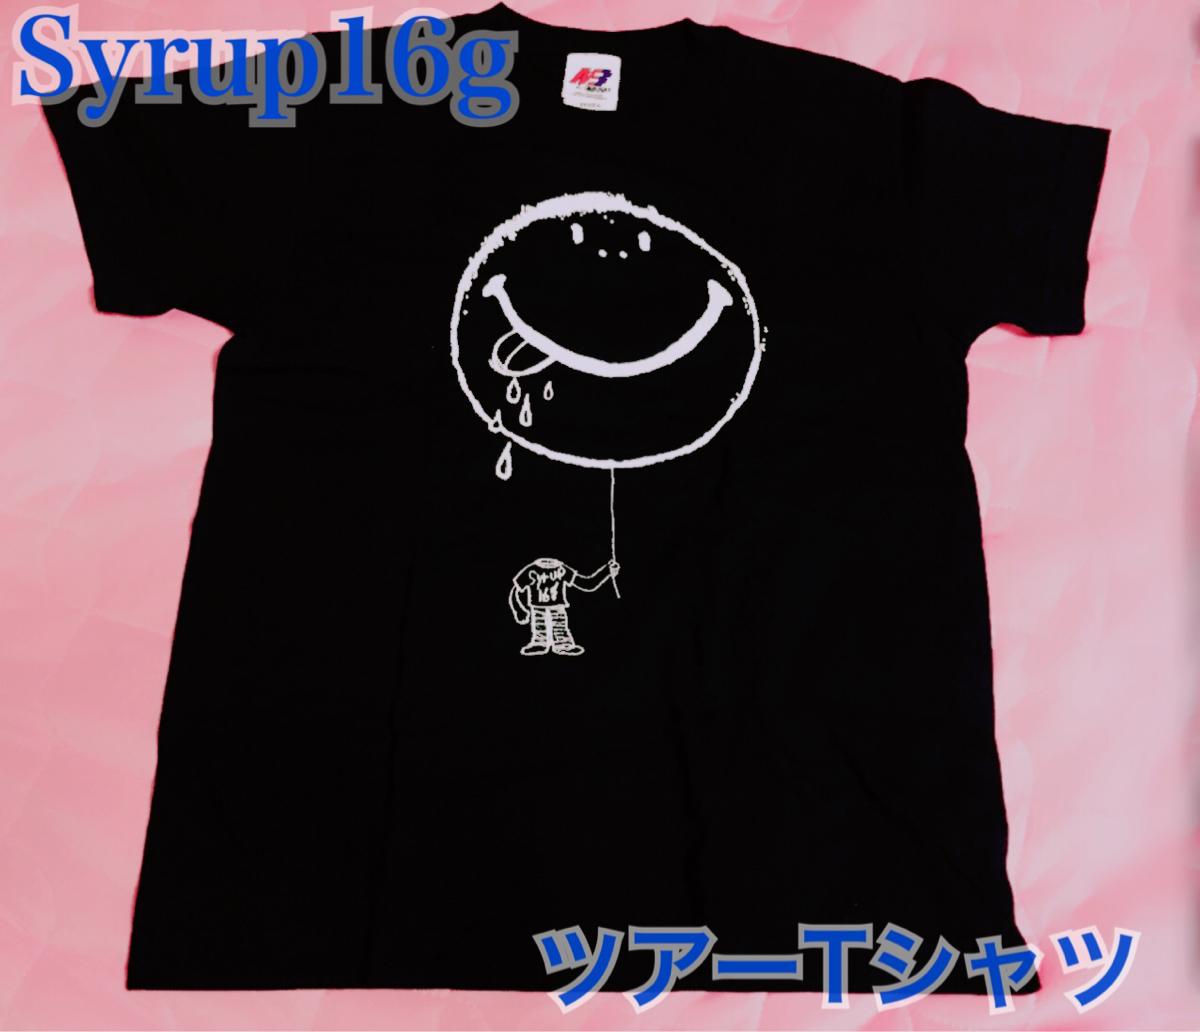 【Syrup16g】激レア ツアーTシャツ 黒 youth-L 入手困難☆五十嵐隆☆シロップ☆グッズ